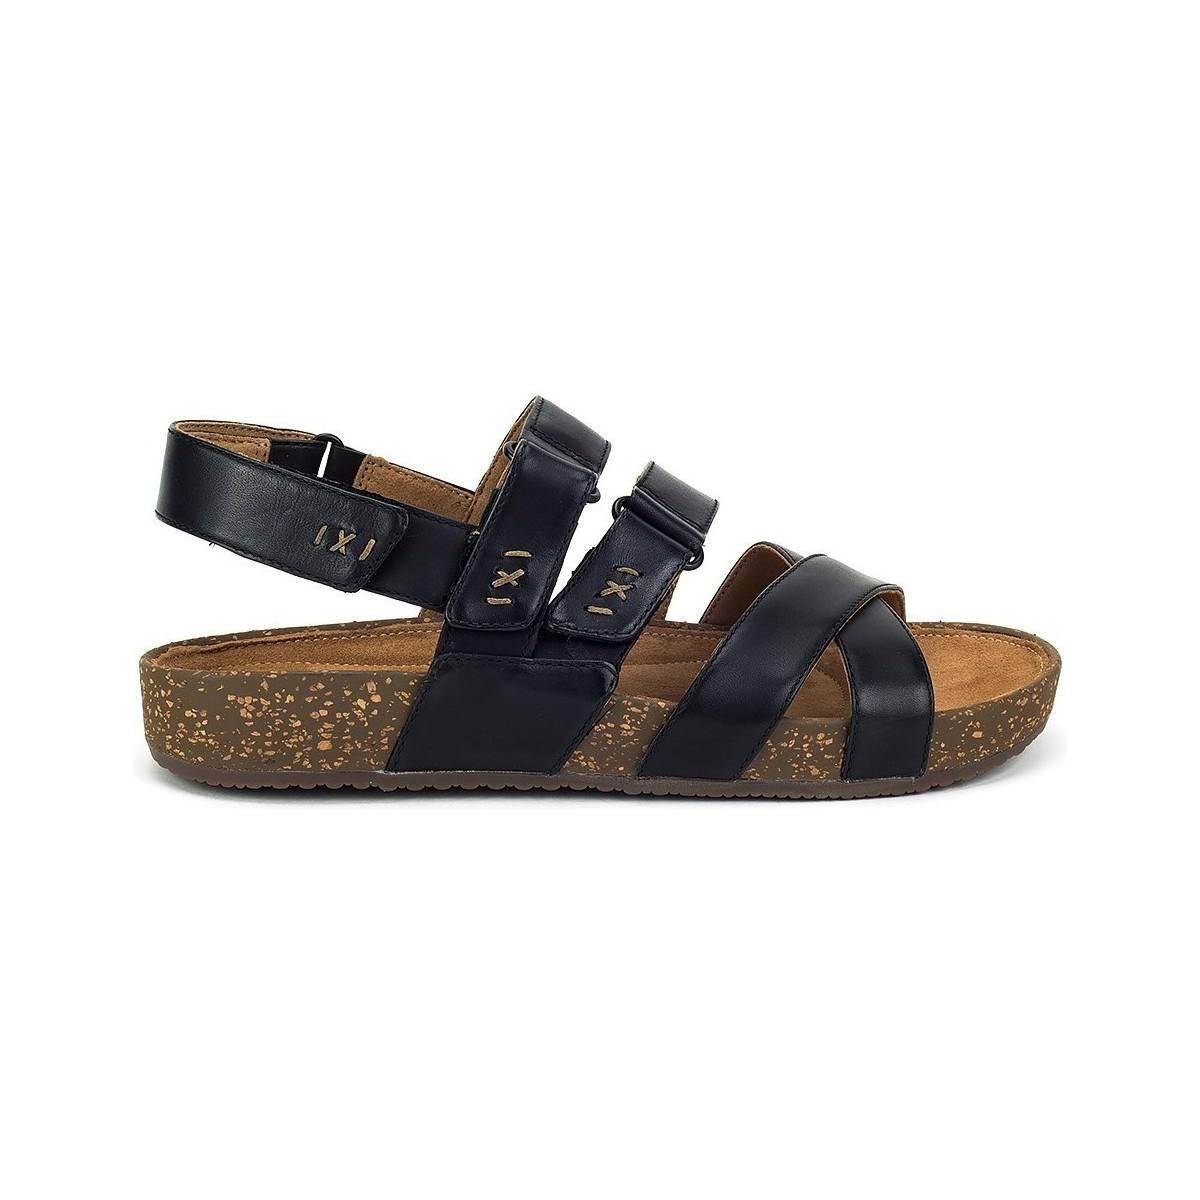 060e8e115c8cc2 Clarks Rosilla Keene Women s Sandals In Black in Black - Lyst